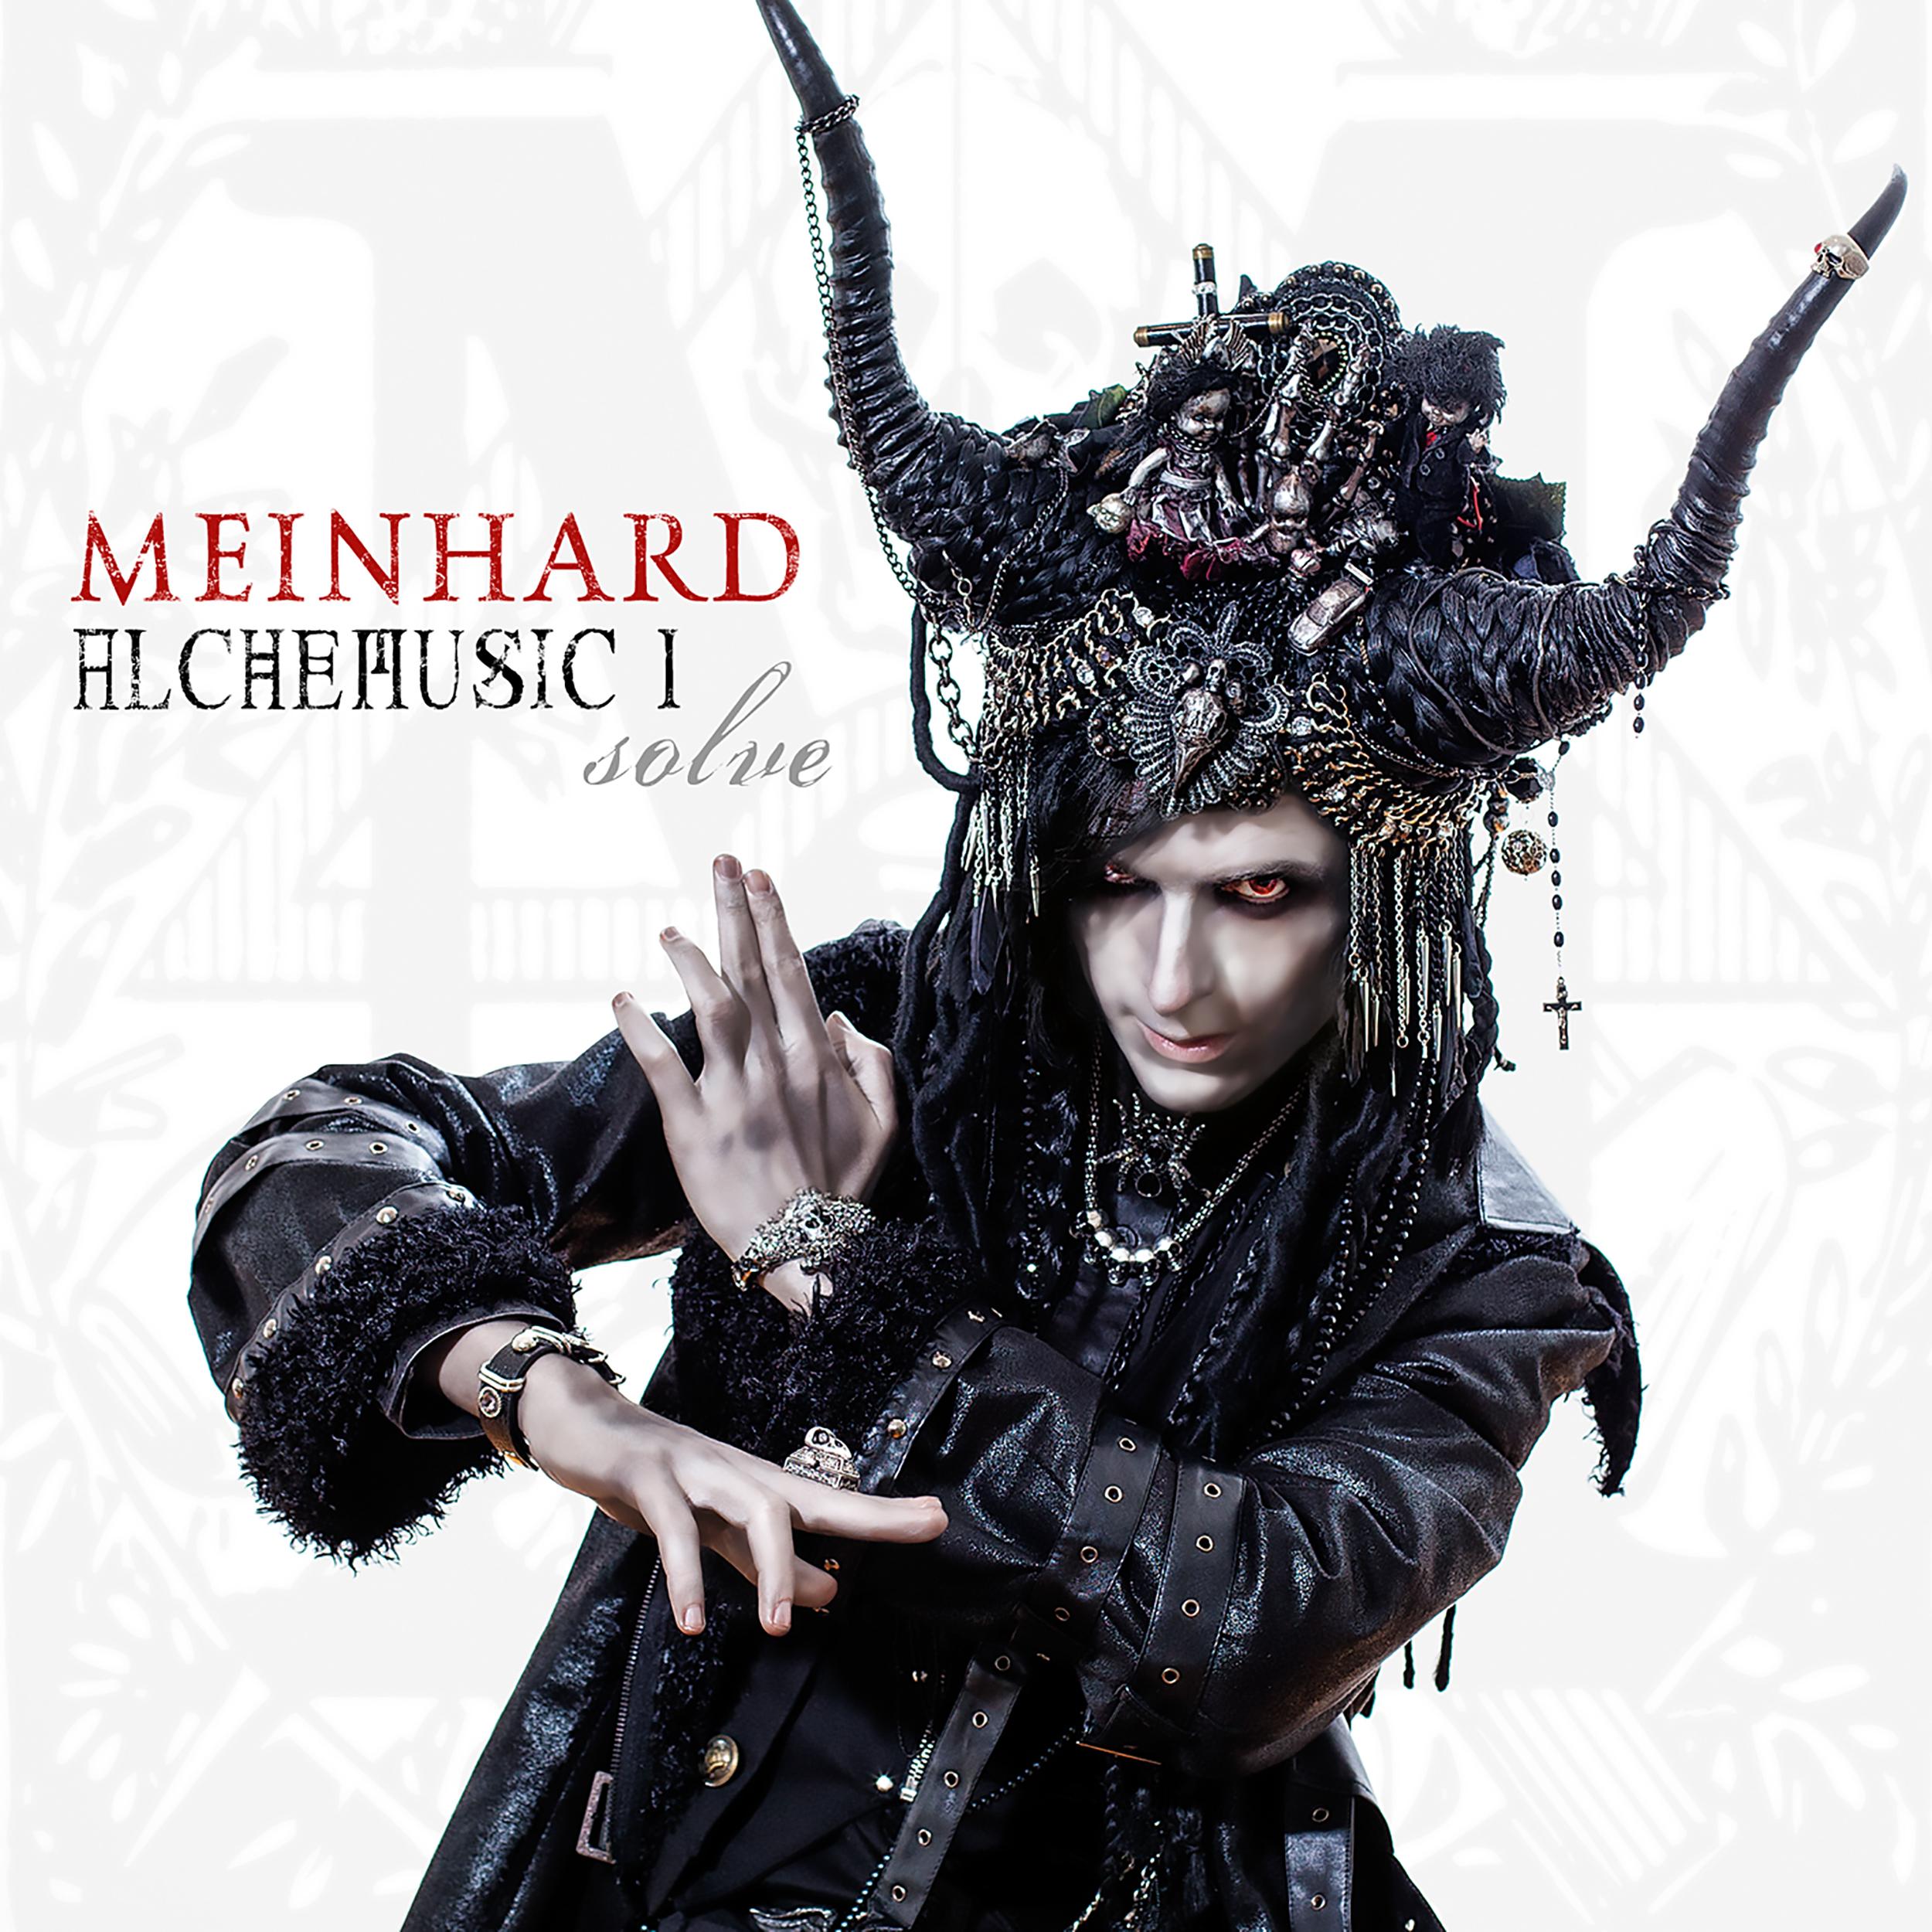 Meinhard ALCHEMUSIC I - SOLVE